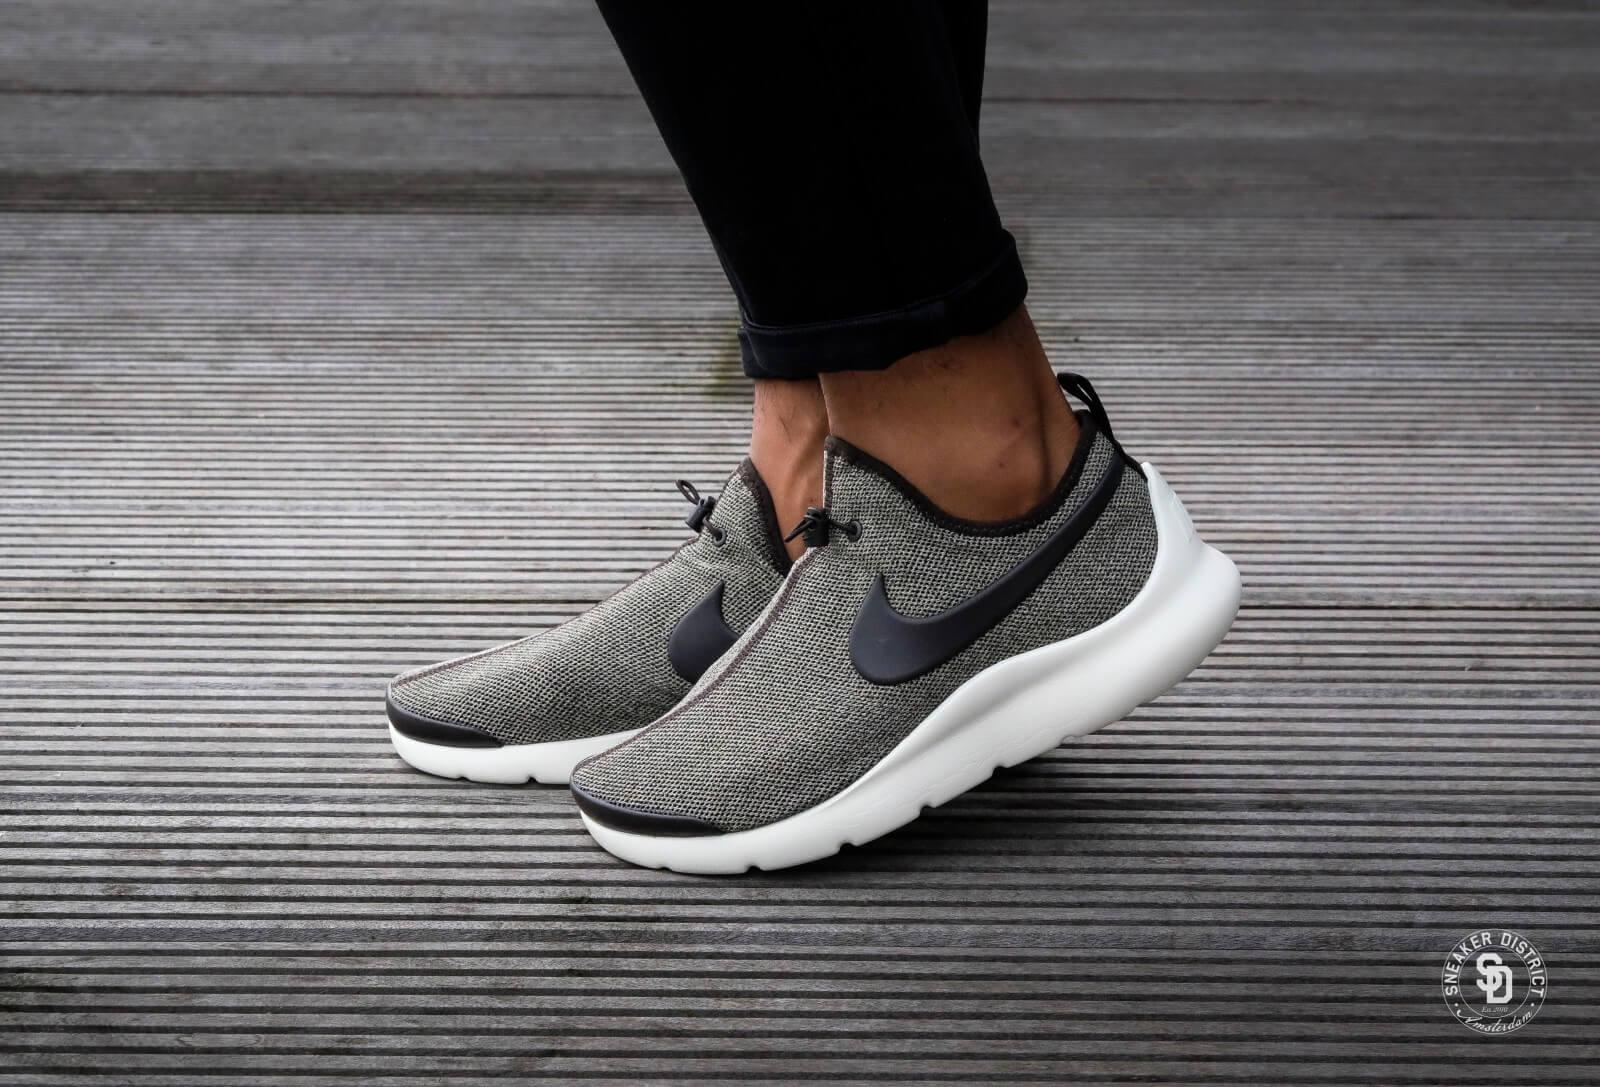 Nike Aptare SE Khaki / Vervet Brown